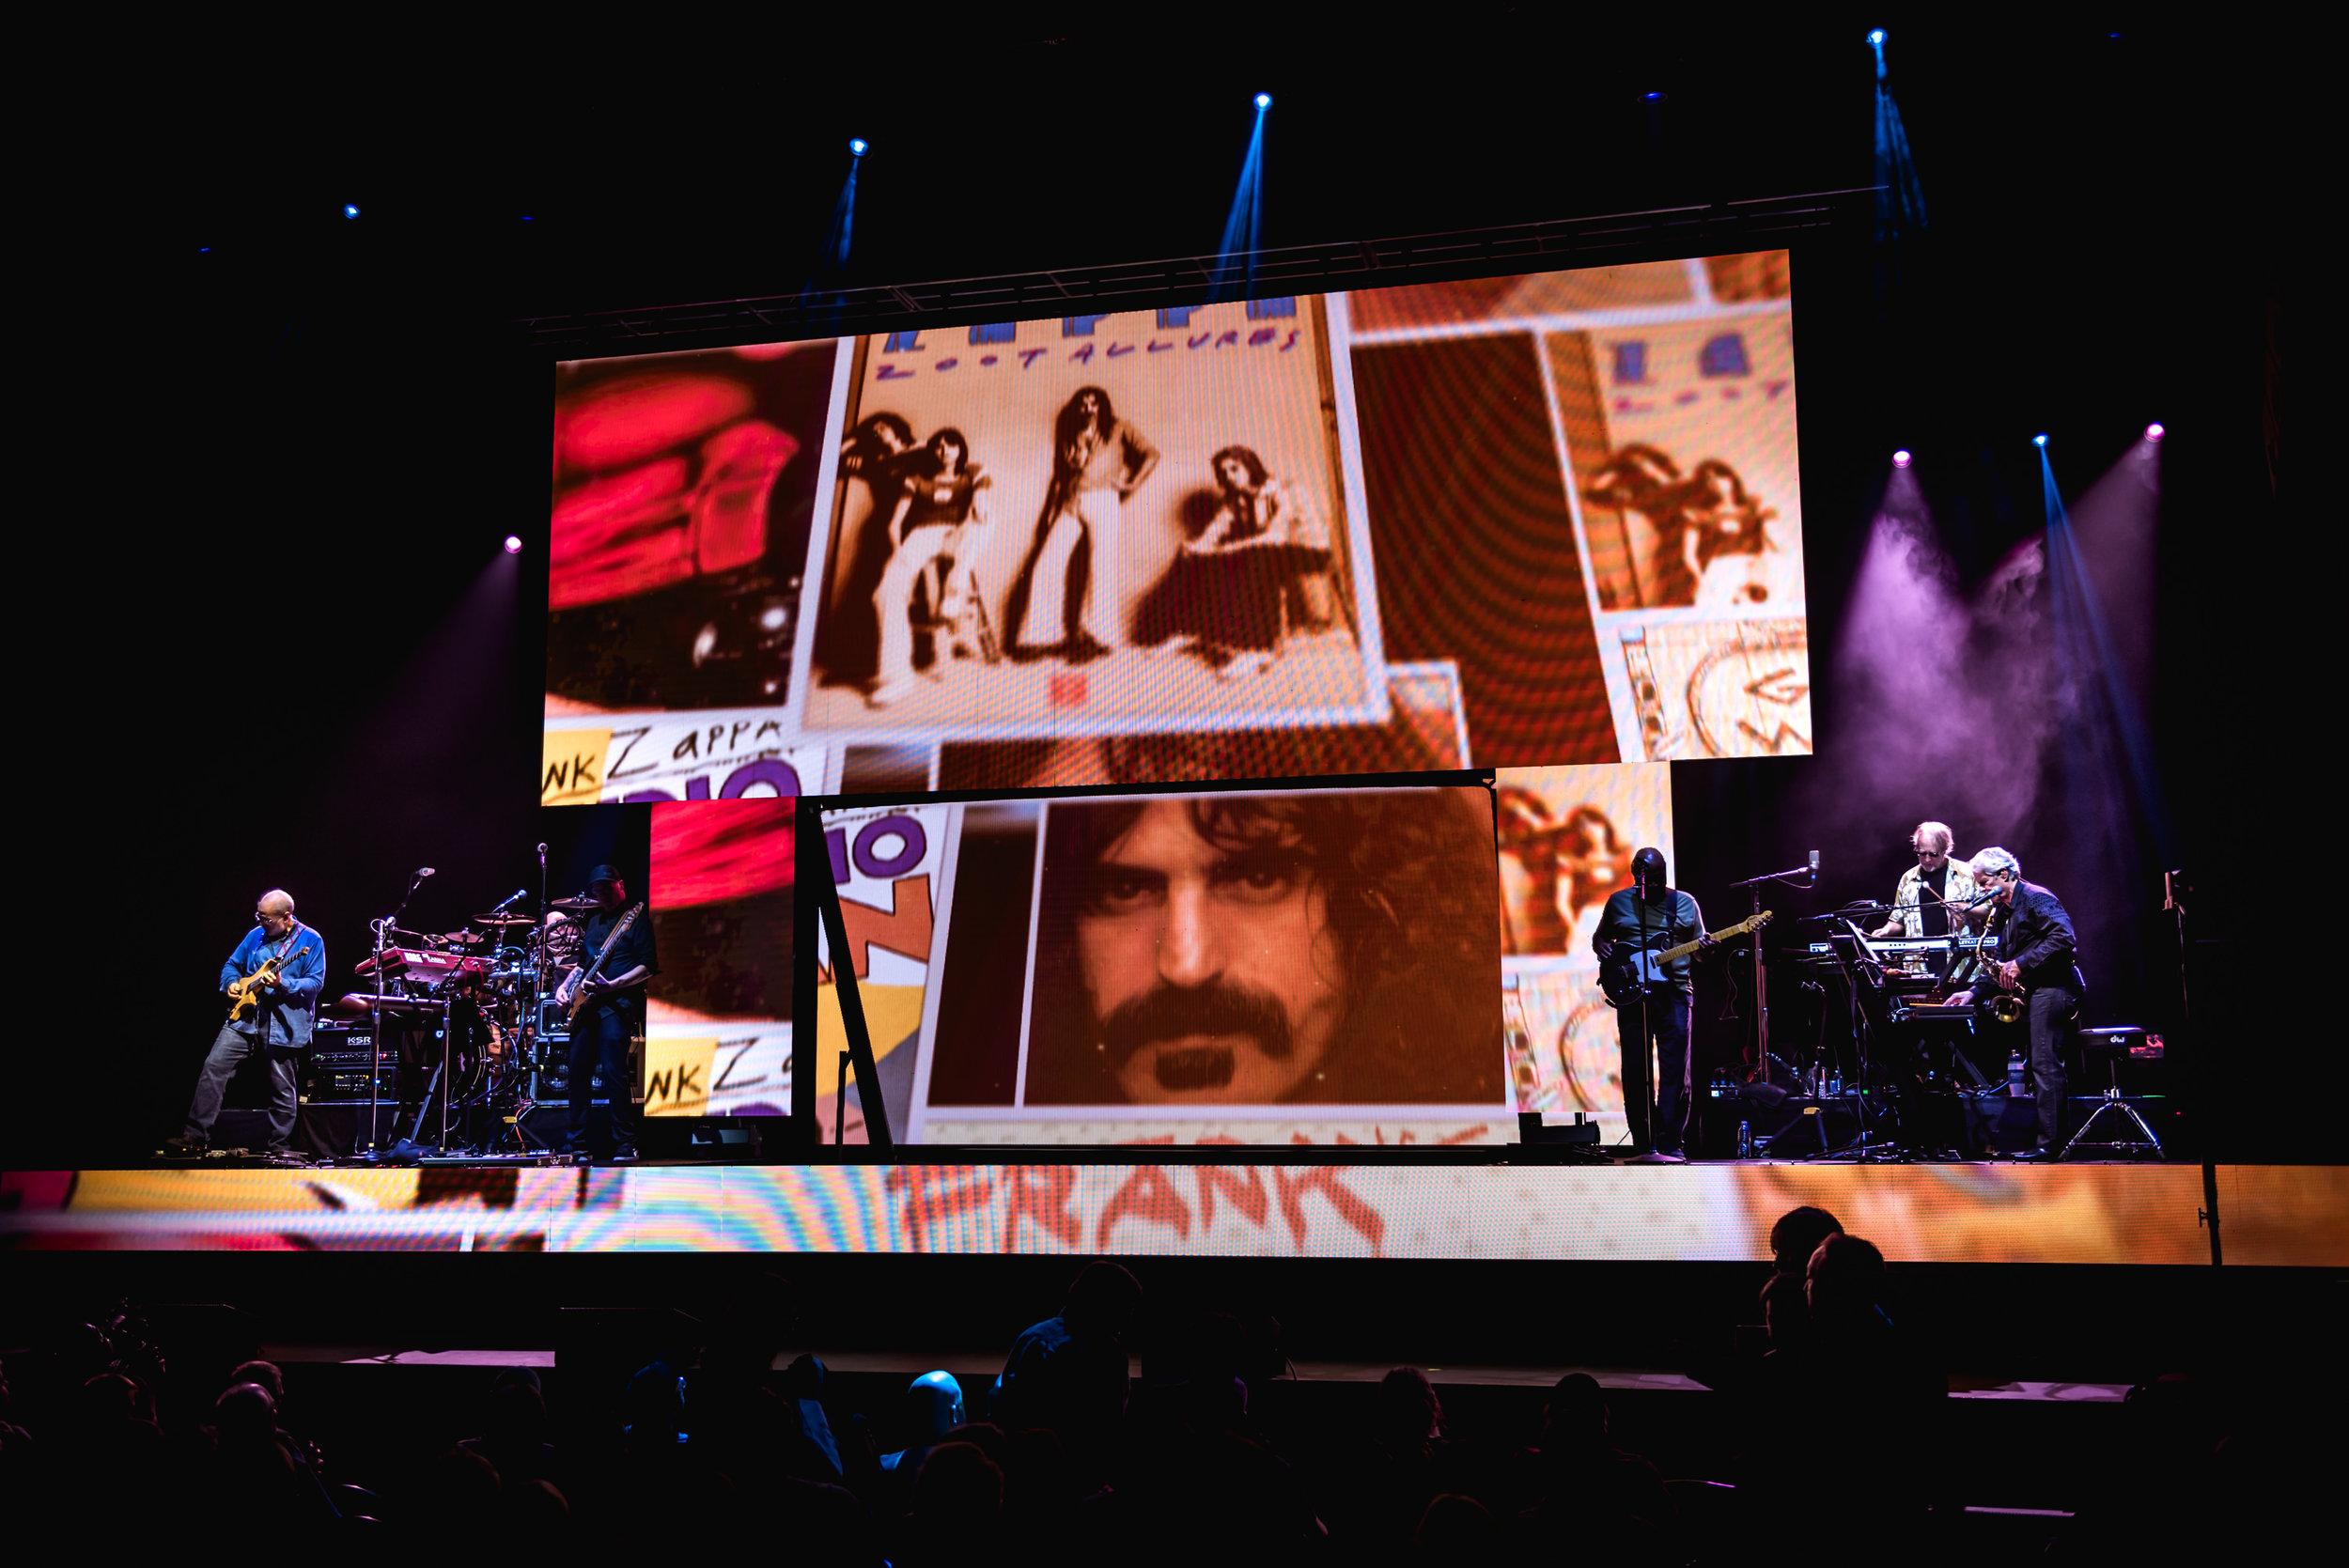 Frank Zappa Hologram Tour-15.jpg